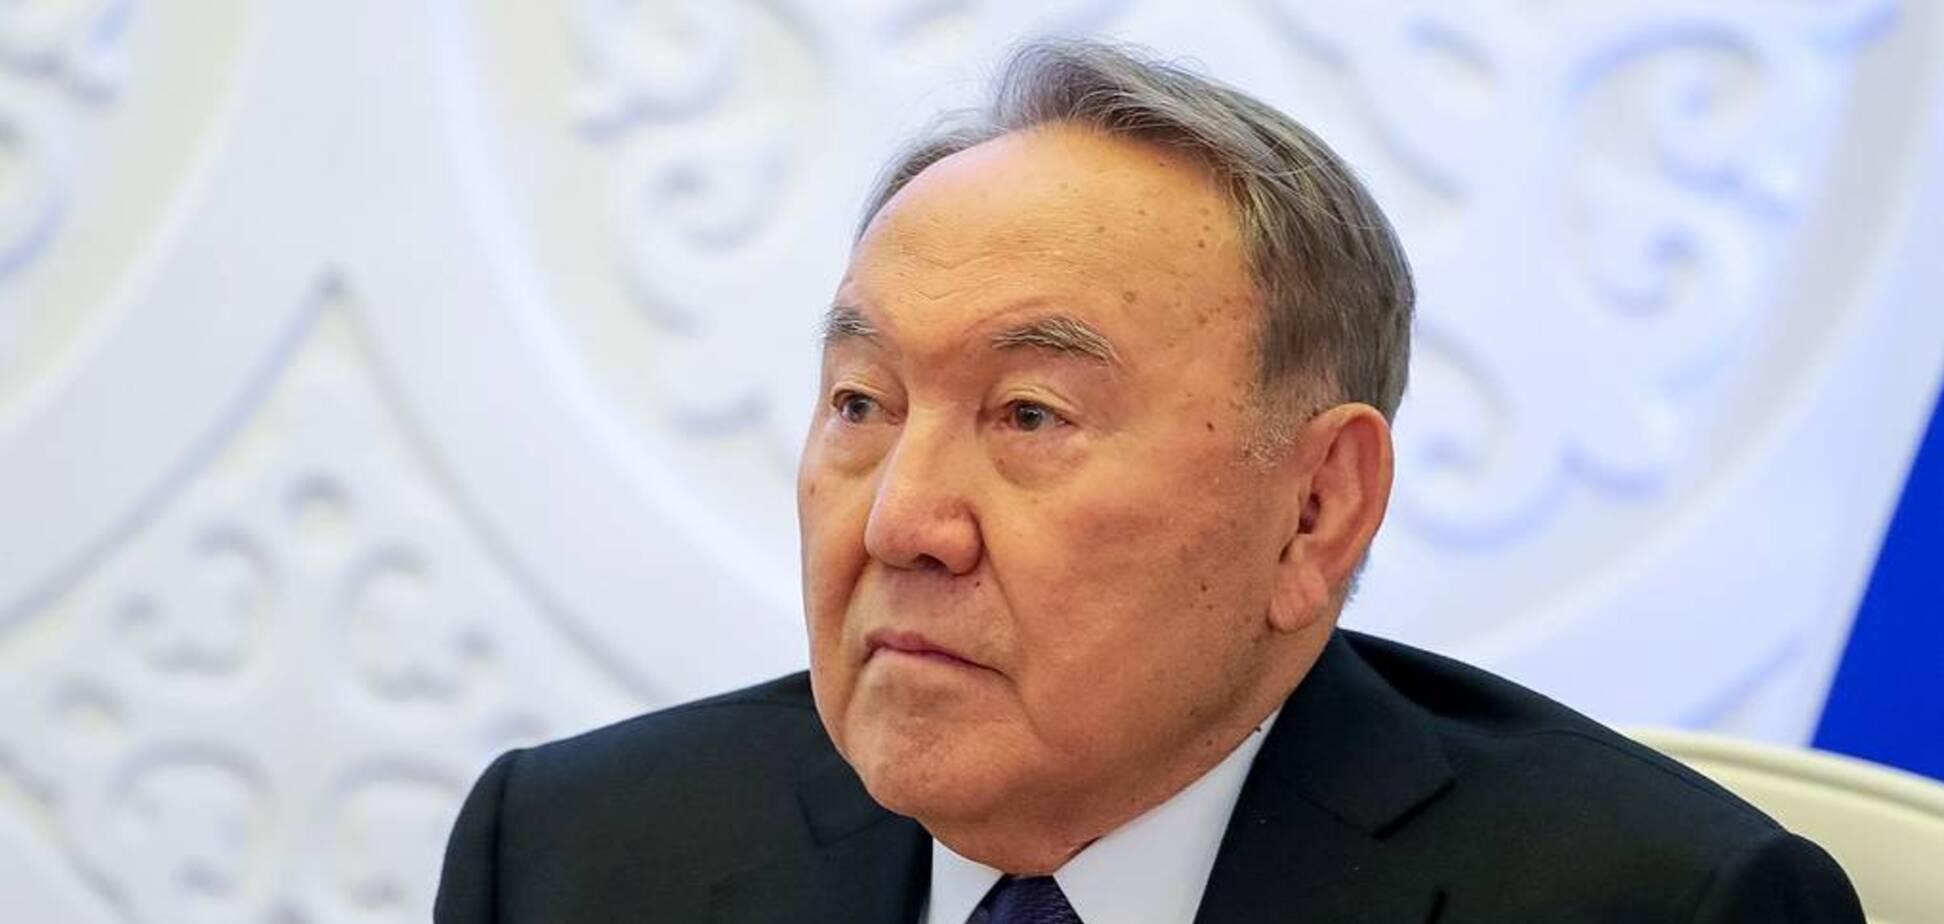 Не уберегли Назарбаева. Вовремя